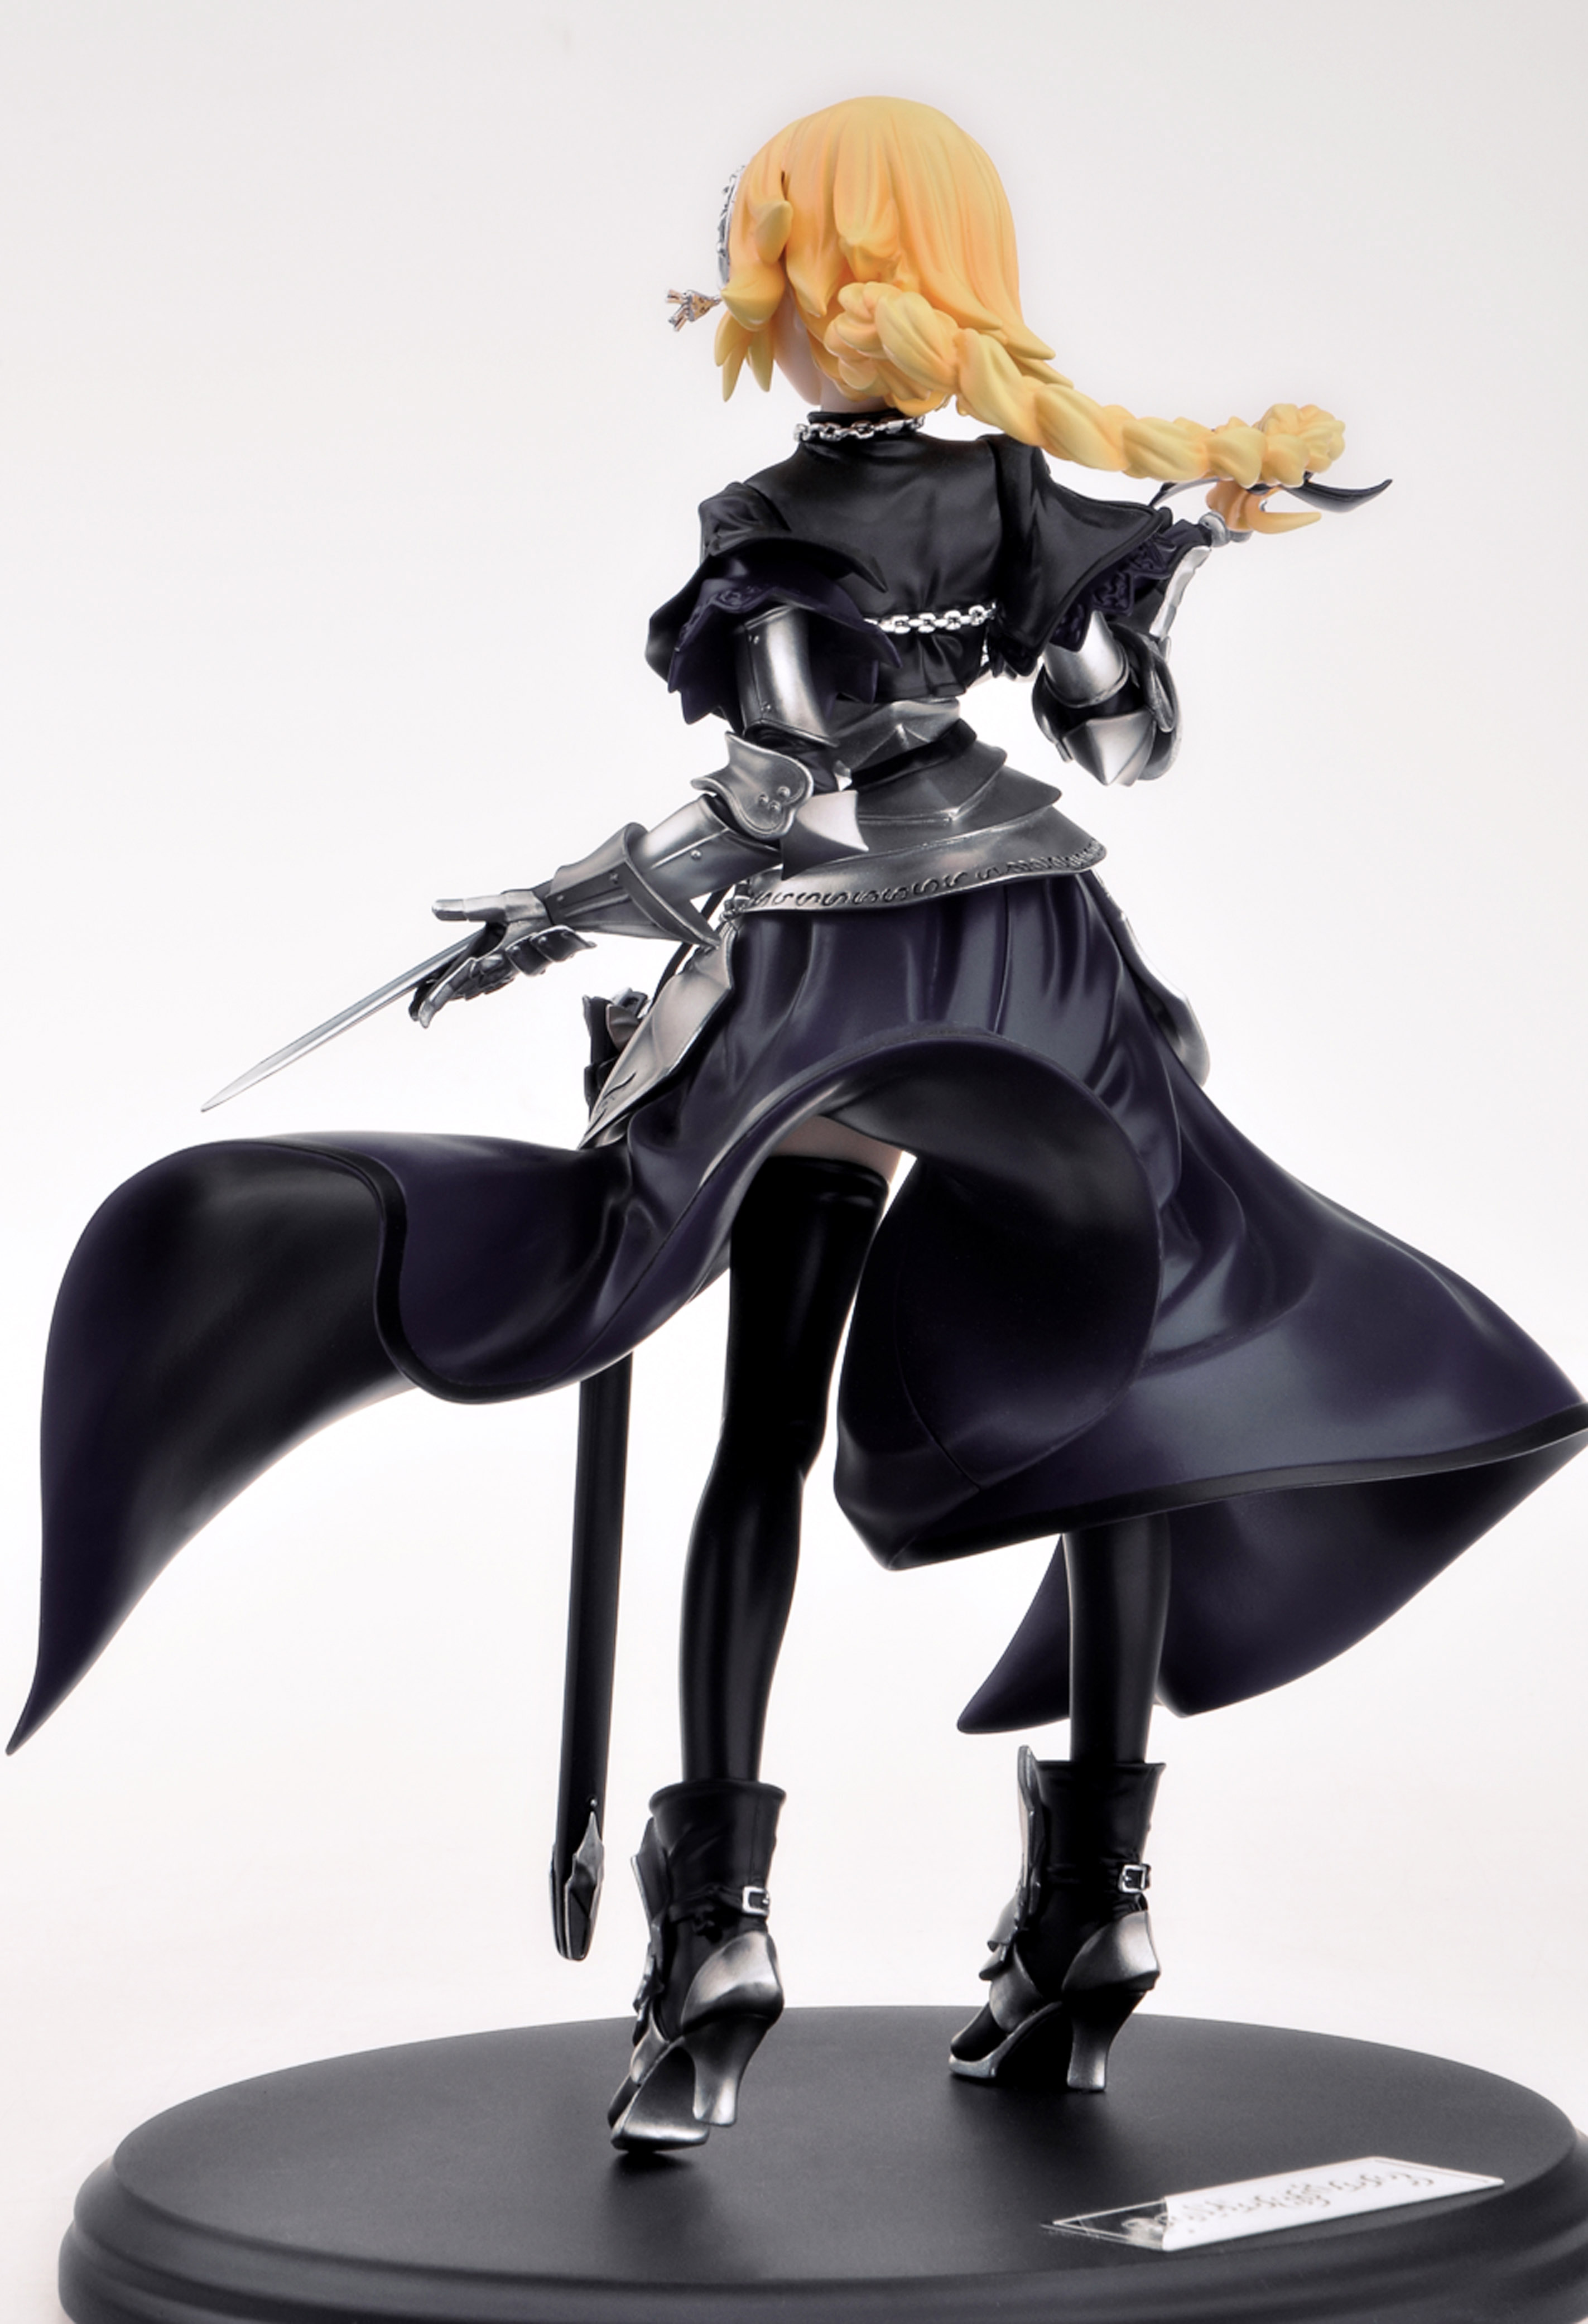 Fate Series Jeanne Ruler prepainted figure haruhichan.com Fate Stay Night anime figure Ruler Joan of Arc 03